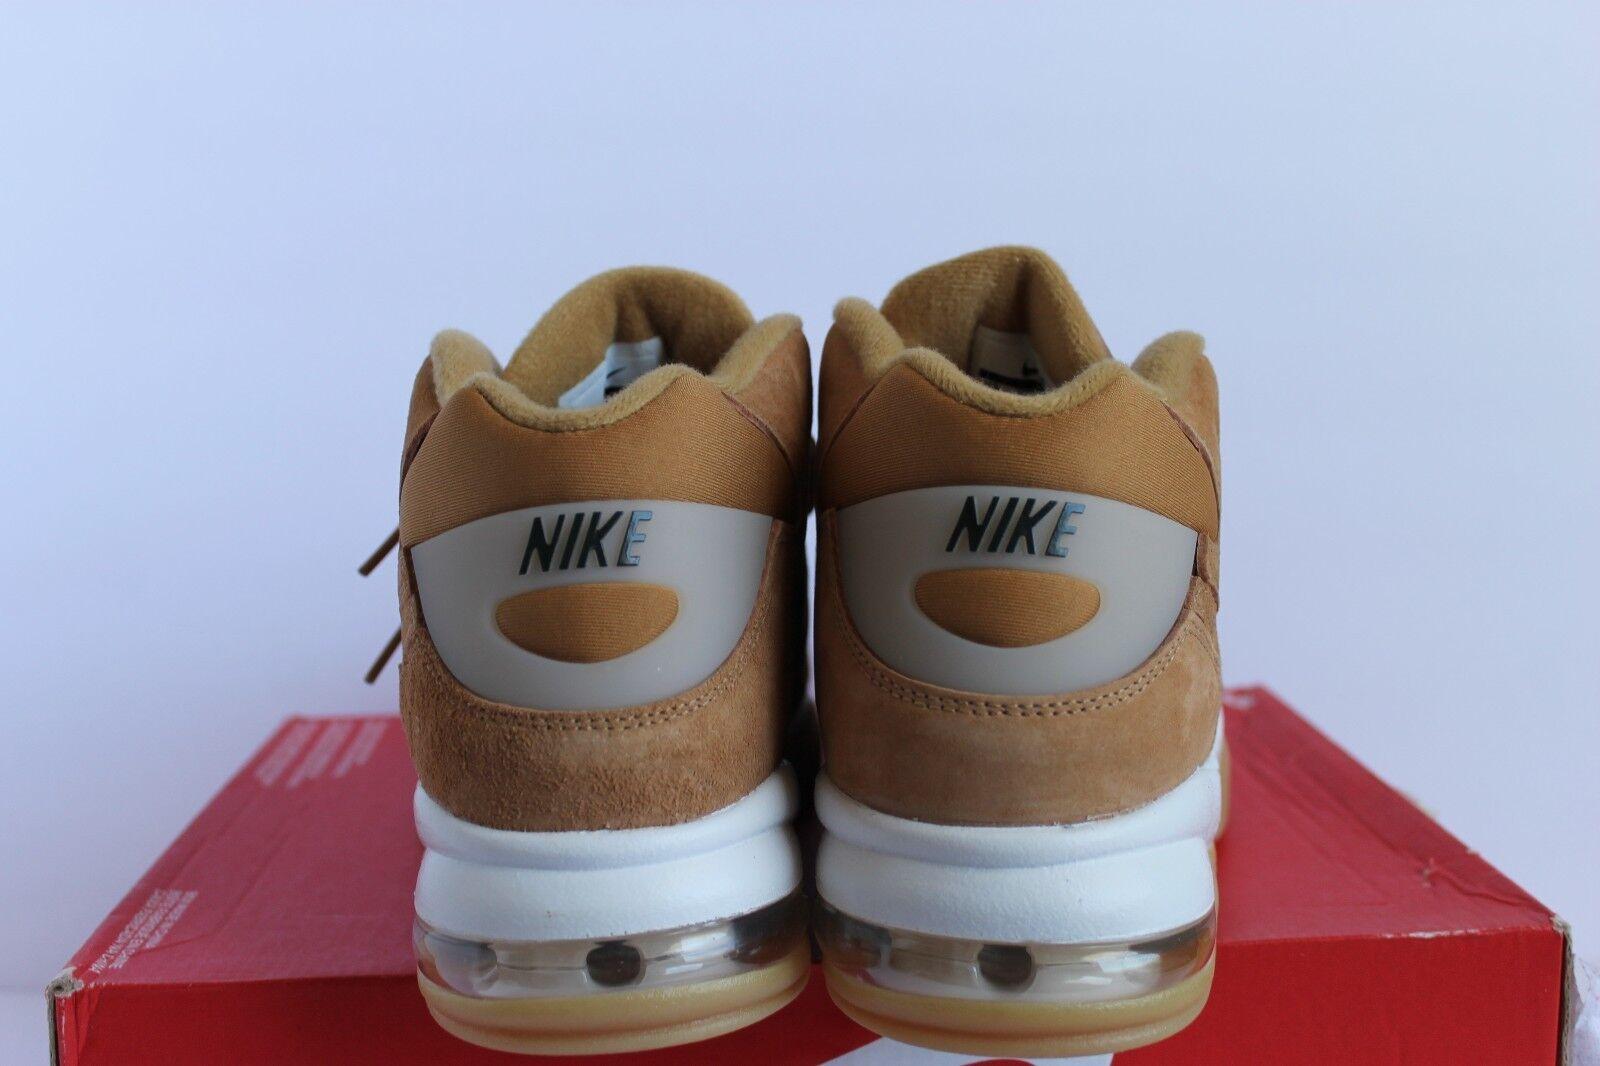 Nike air force max premium premium premium n flachs phantom kaugummi barkley sz. 31131f